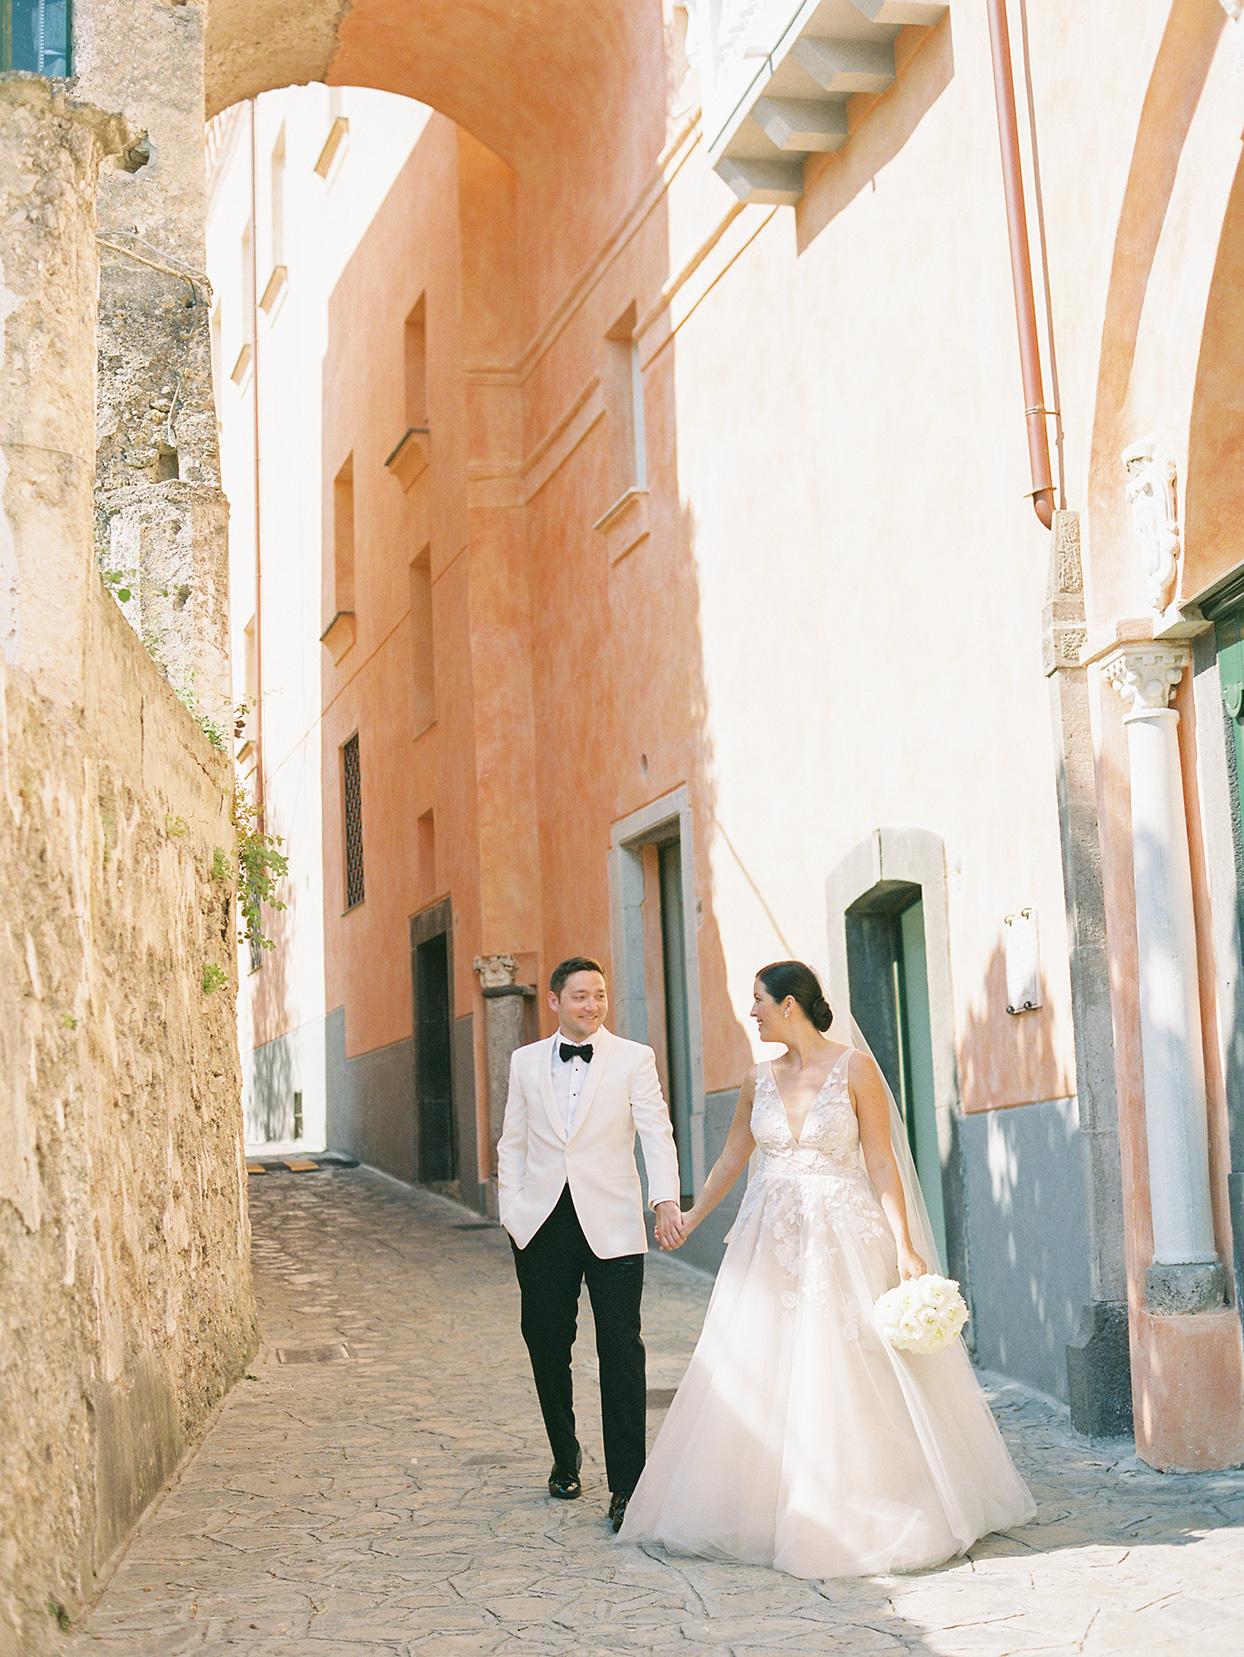 jacqueline david wedding couple walking through italian streets